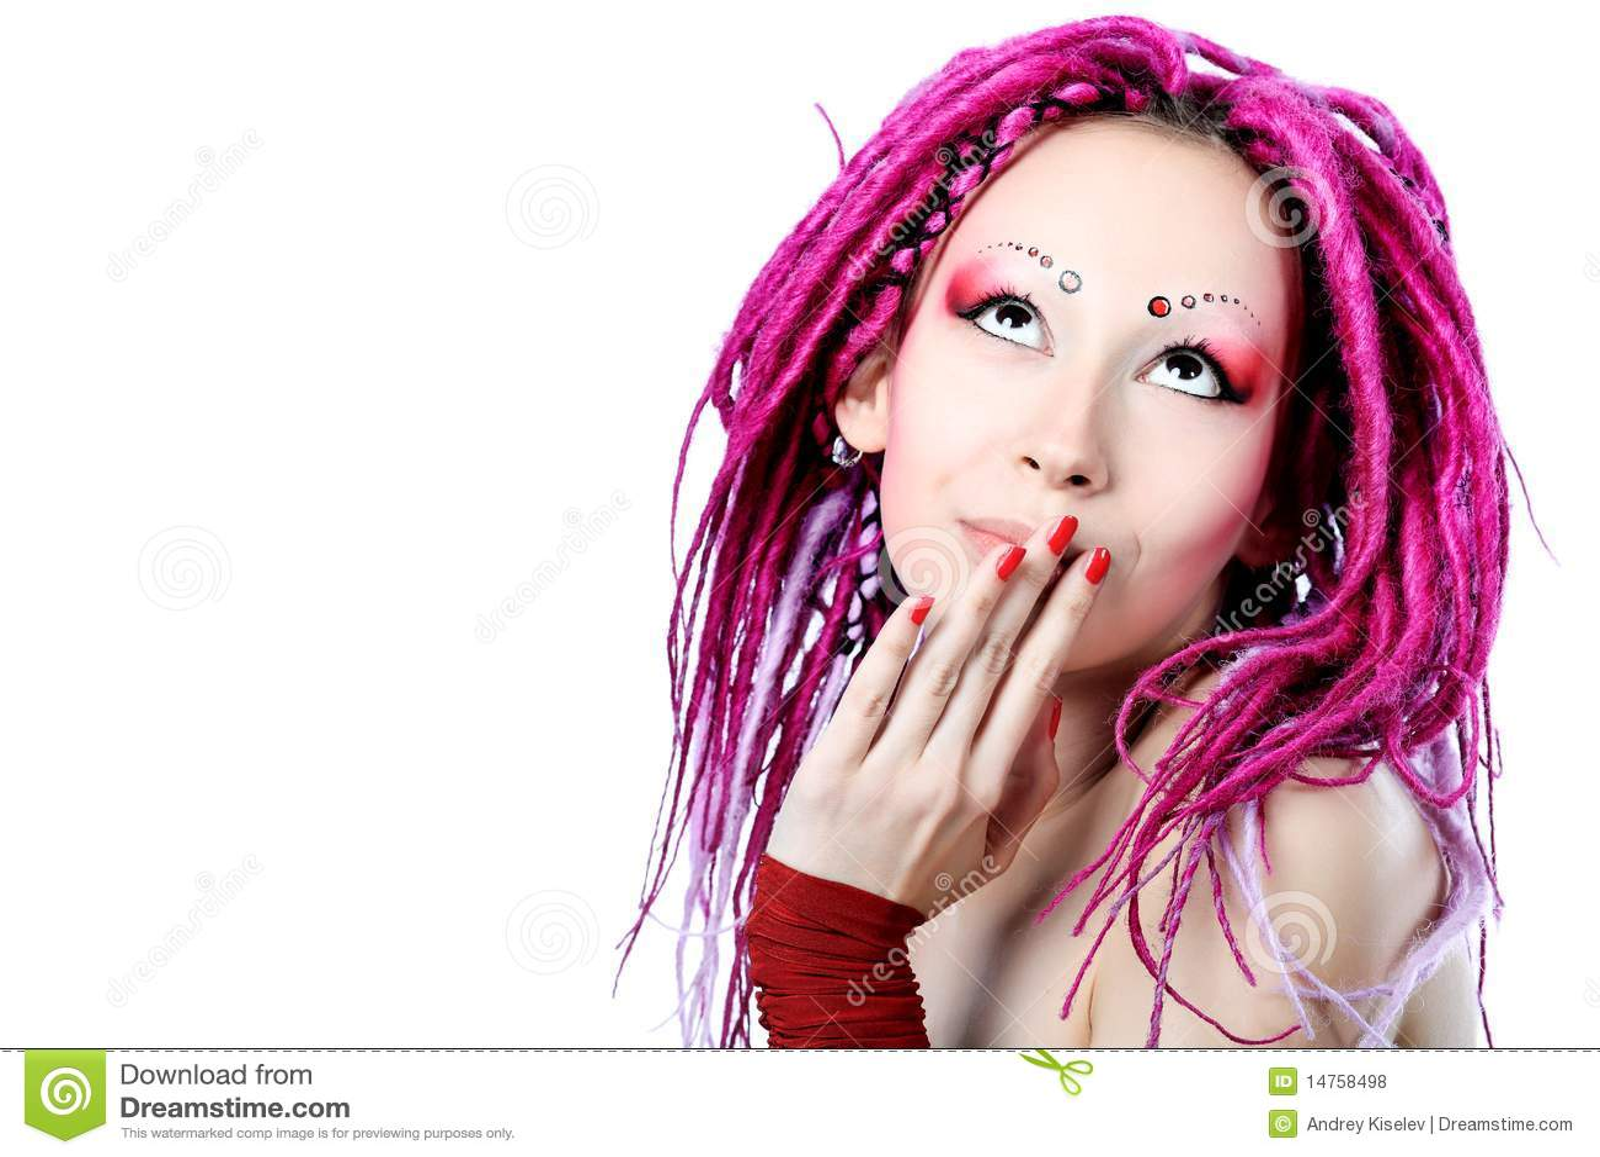 Dreadlocks rosados